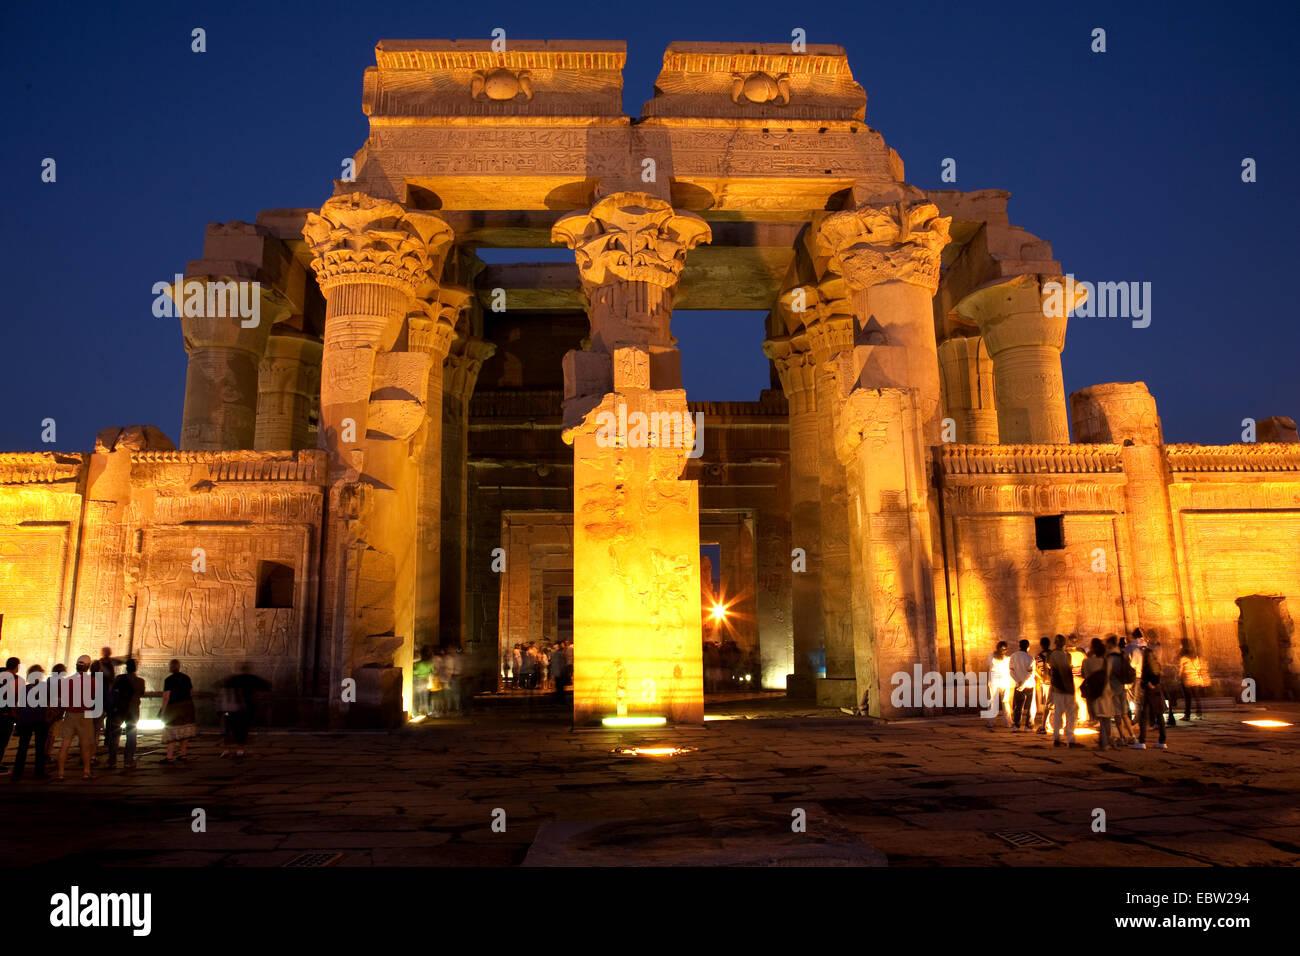 illuminated Temple of Kom Ombo, Egypt, Kom Ombo Stock Photo